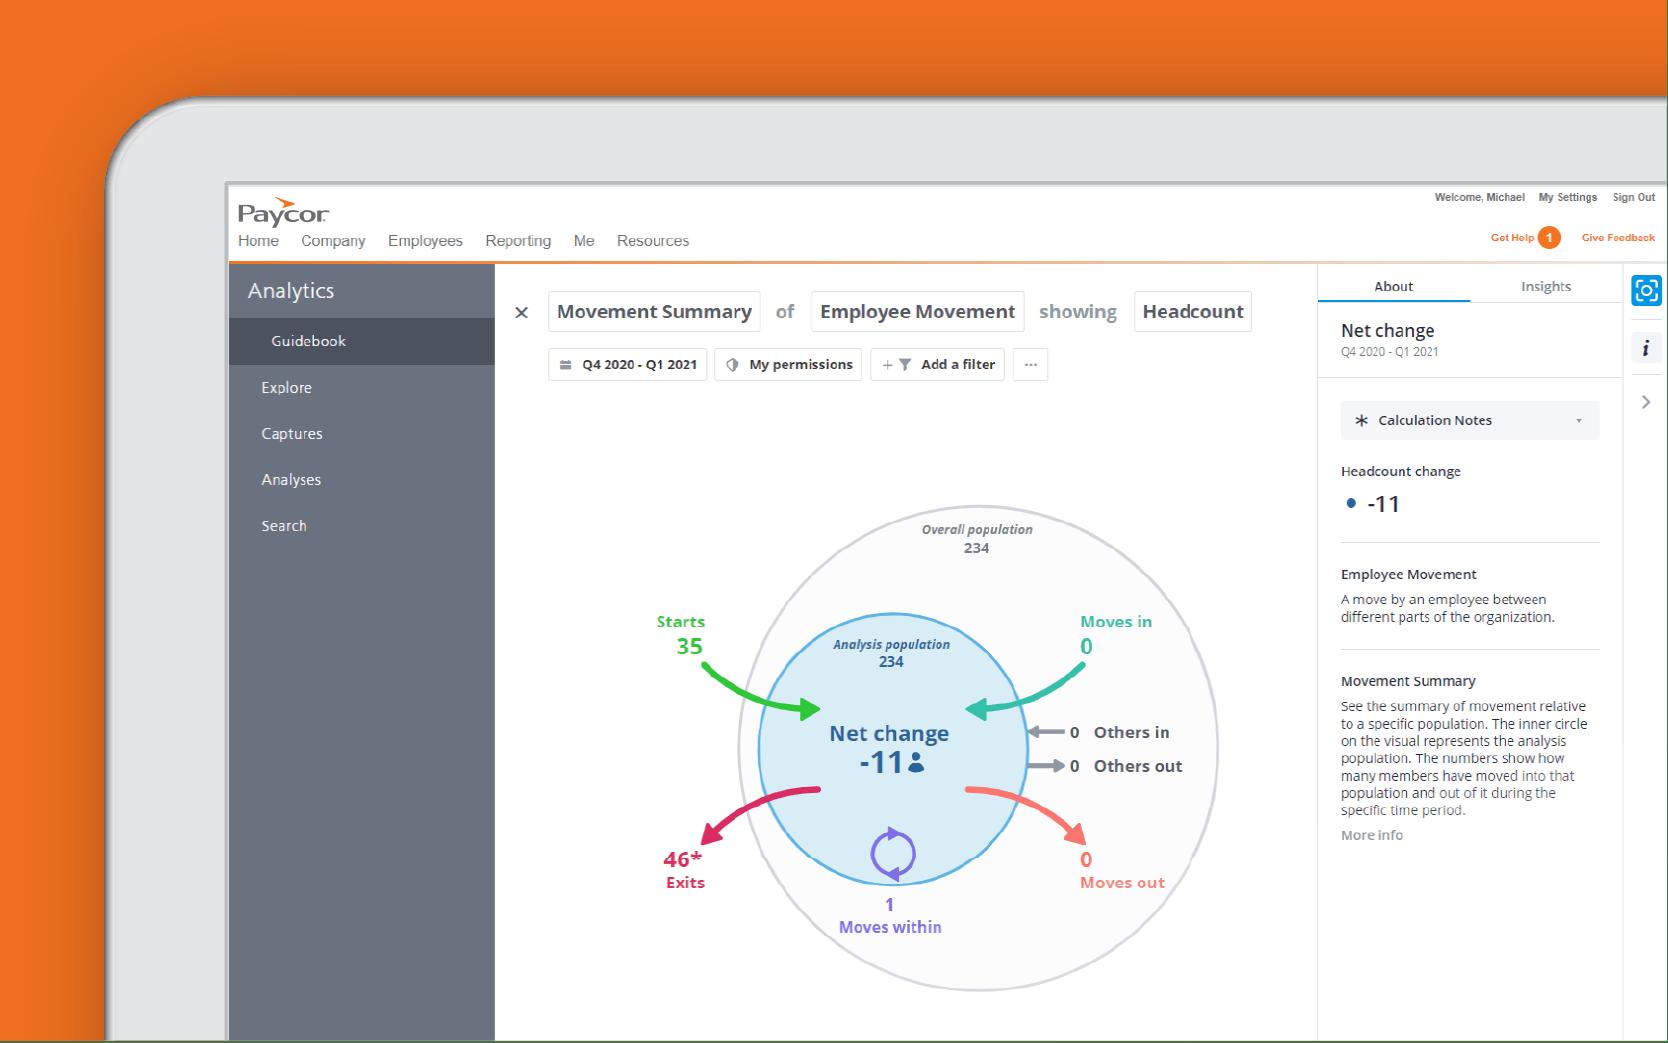 Corner of tablet showing analytics dashboard against orange background